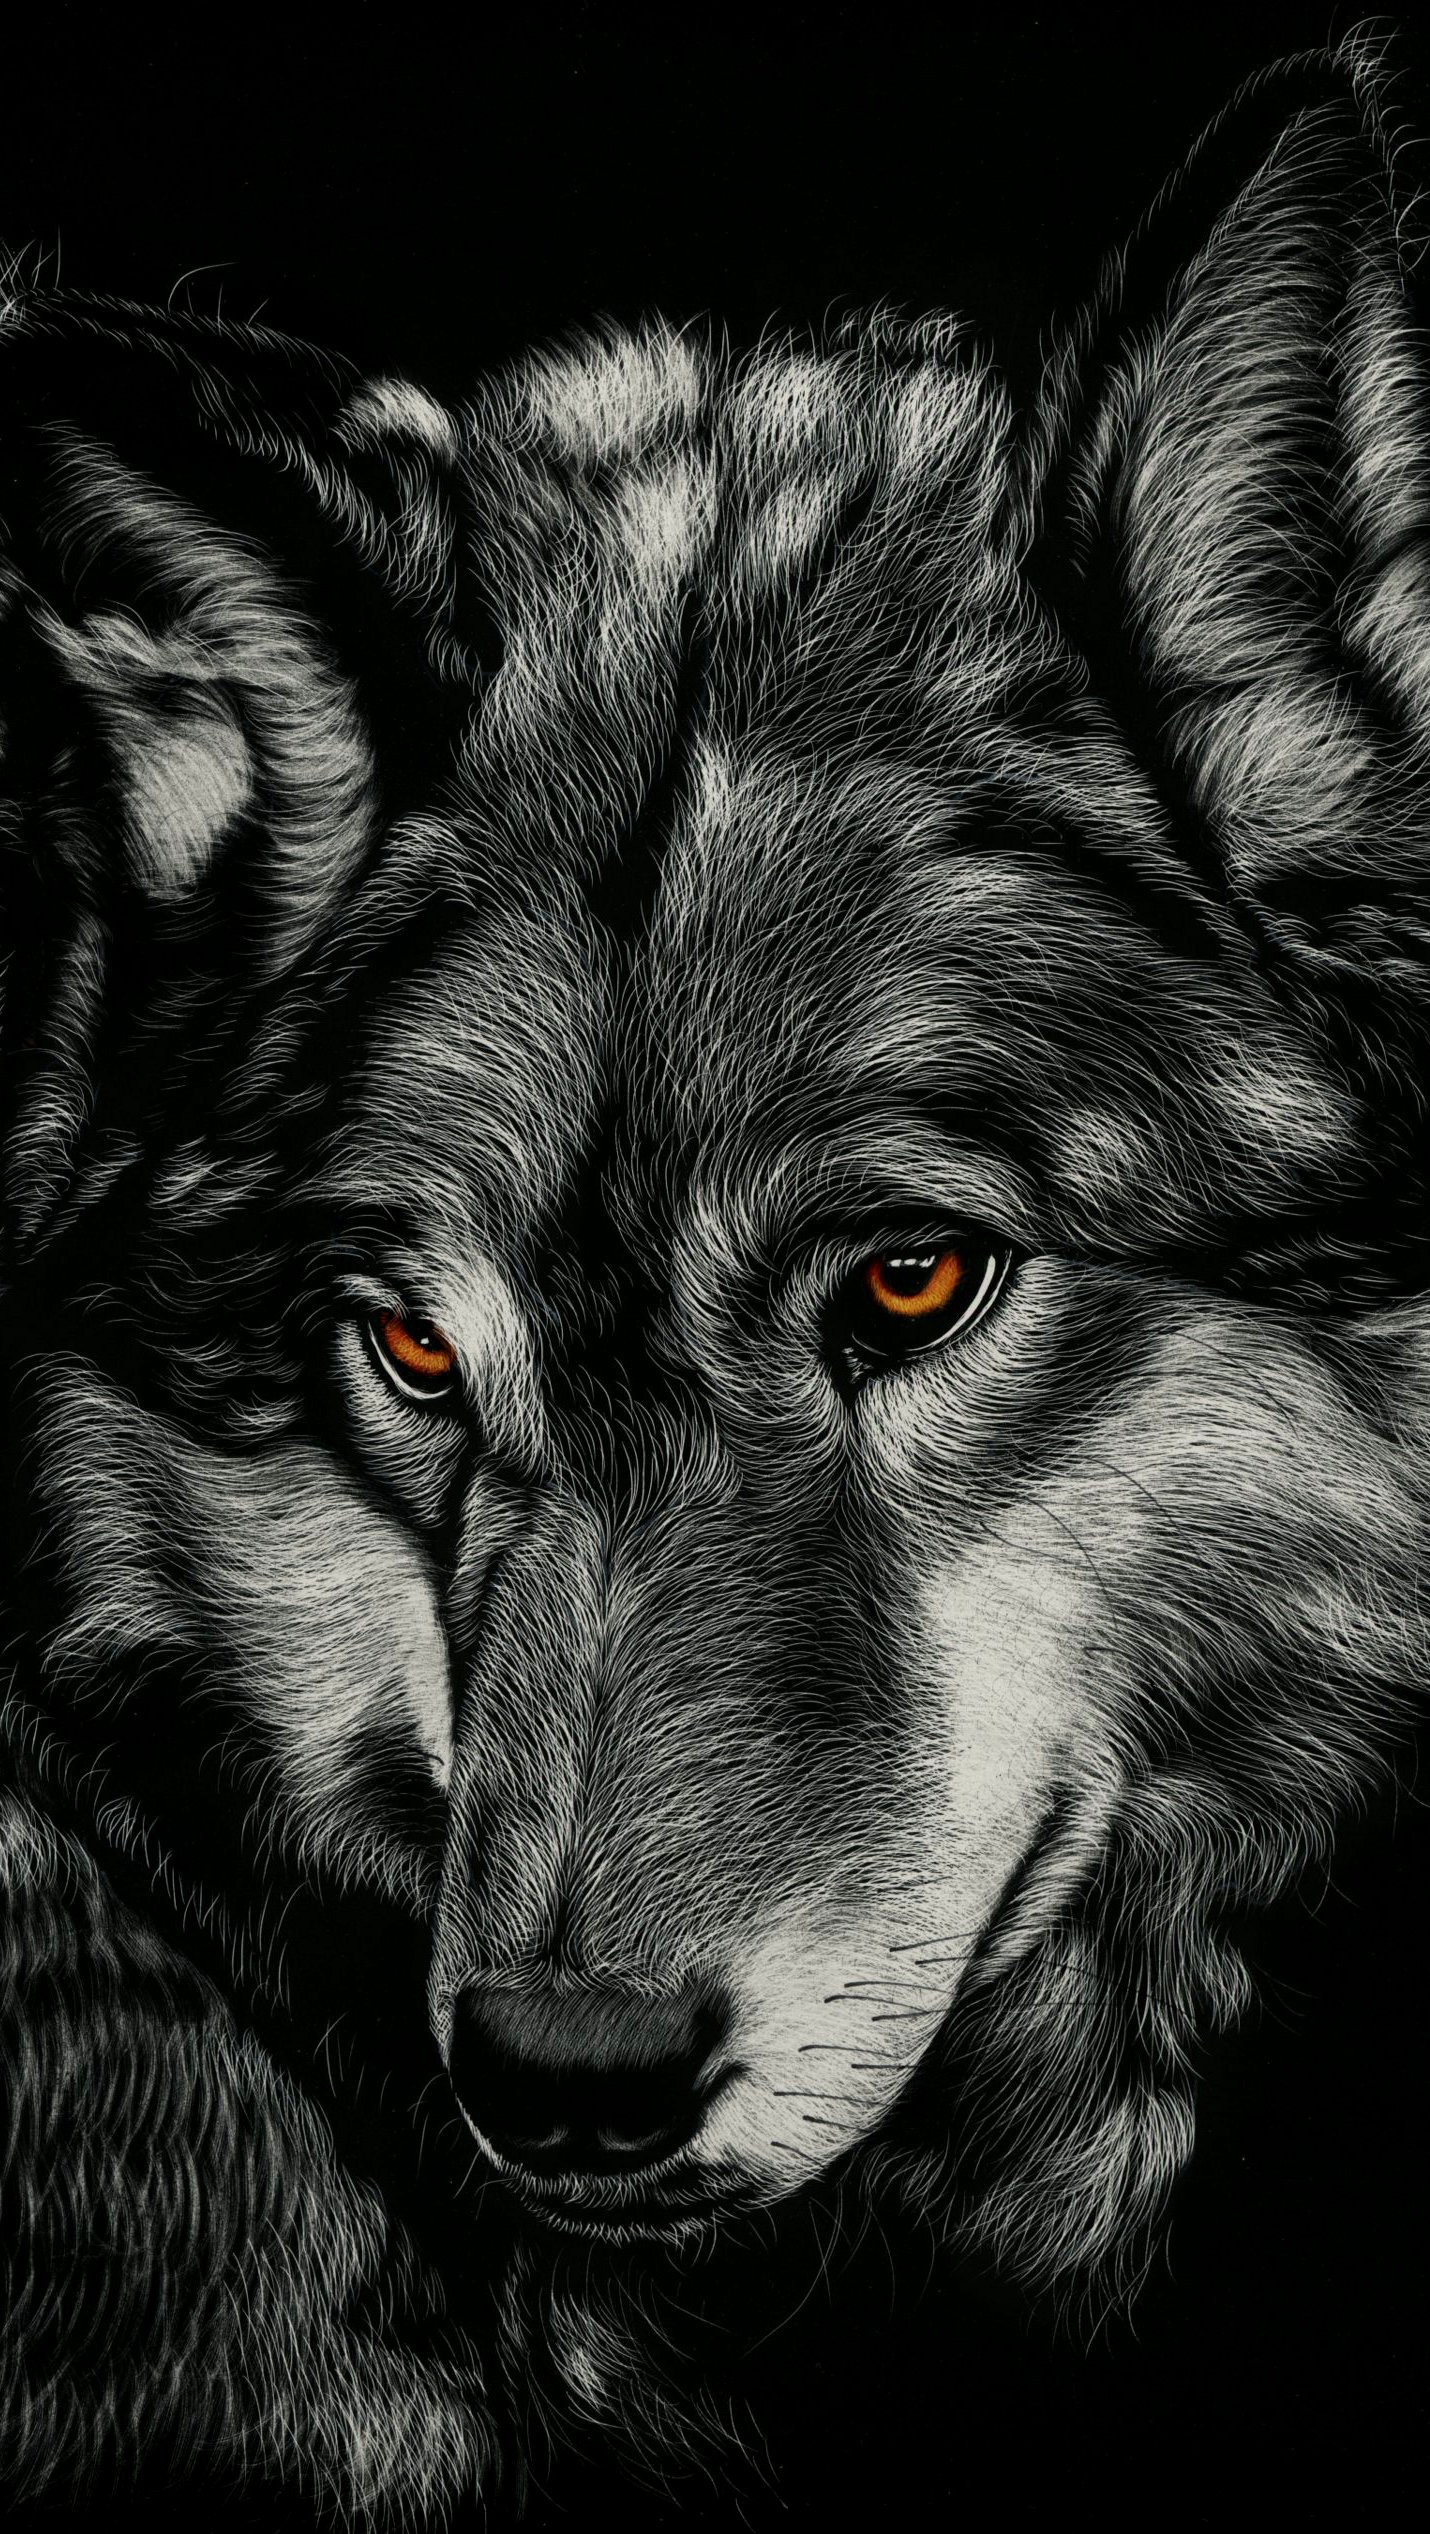 Fondos de pantalla Dibujo lobo Vertical